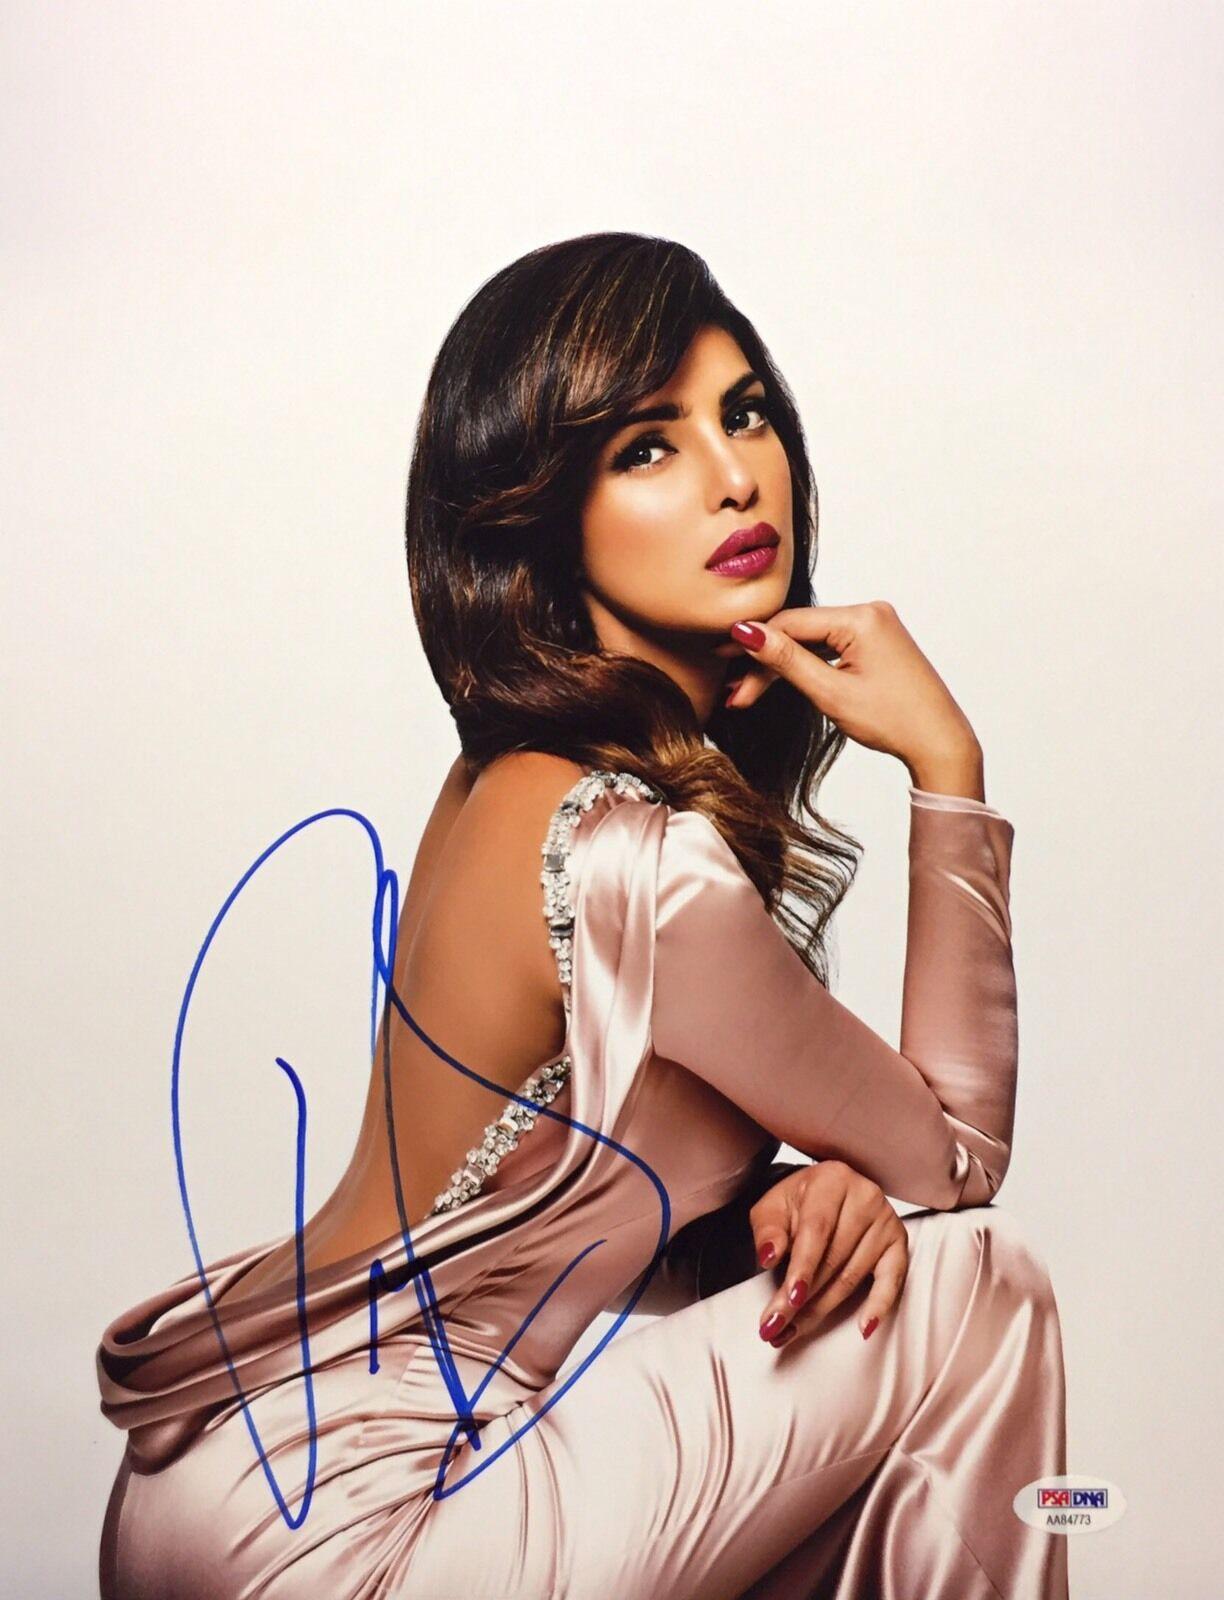 Priyanka Chopra Signed 11x14 Photo *Baywatch *Quantico *Model PSA AA84773